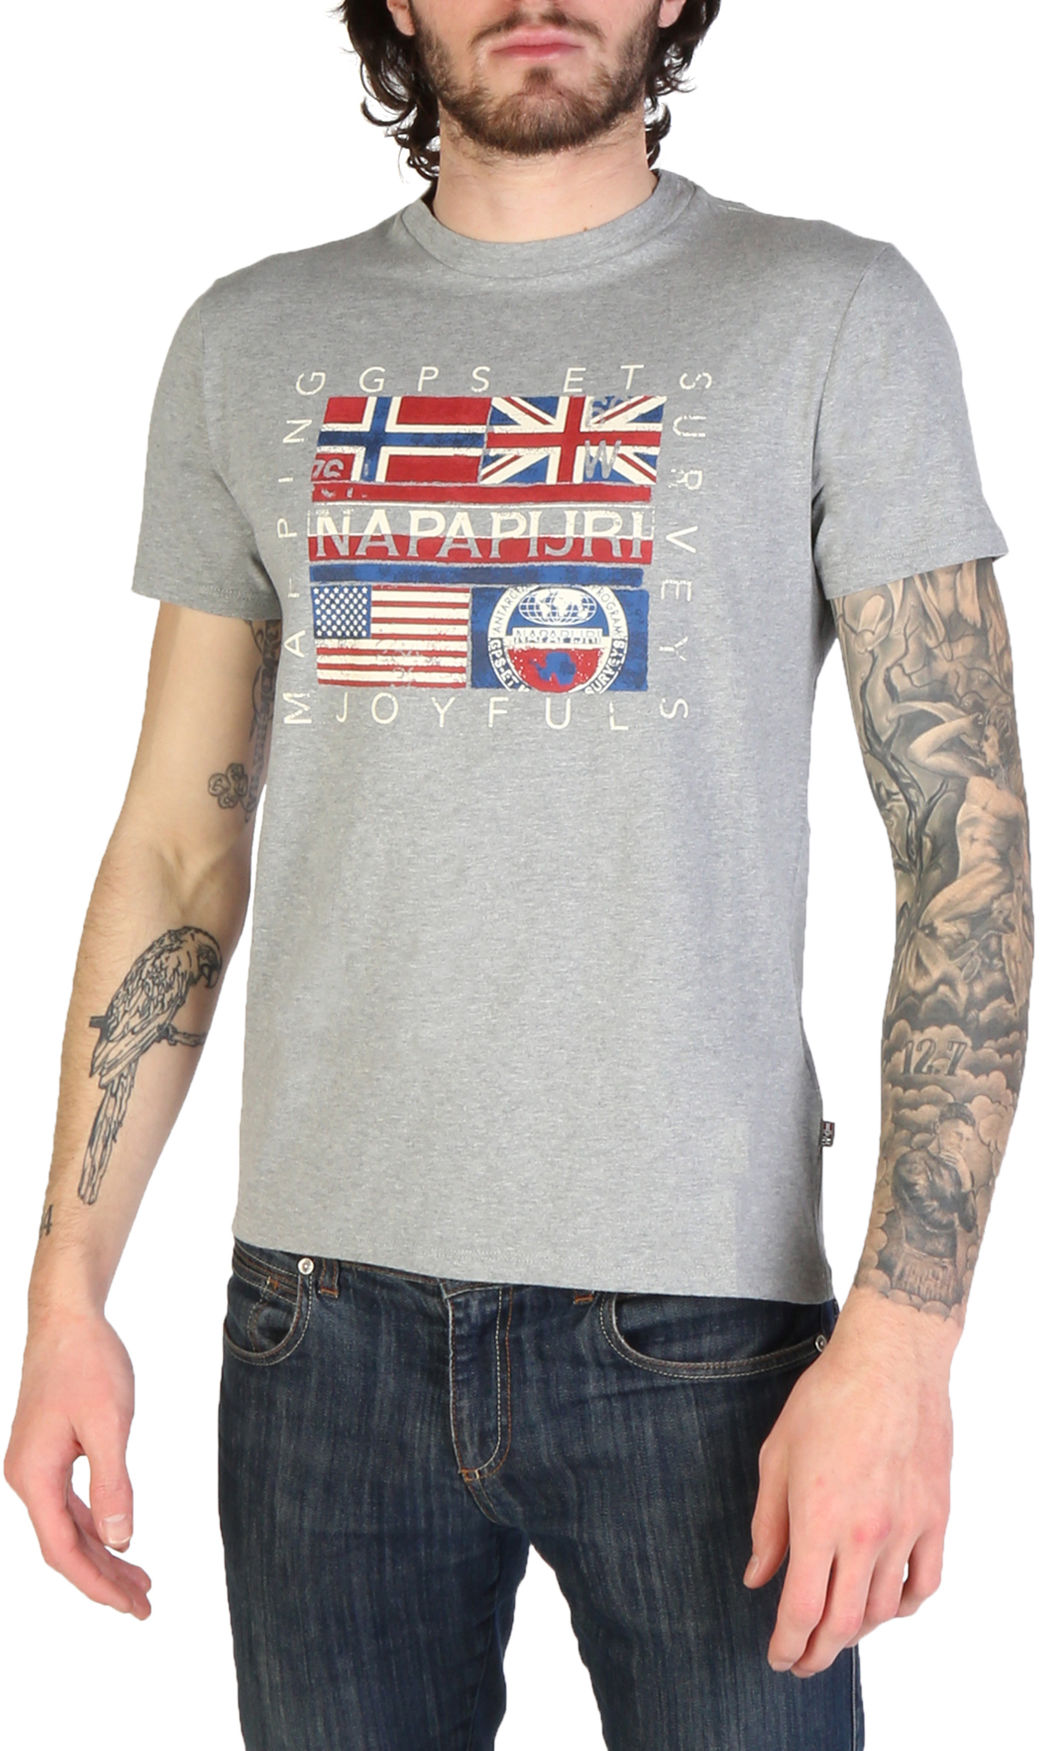 Koszulki Napapijri dla mężczyzn